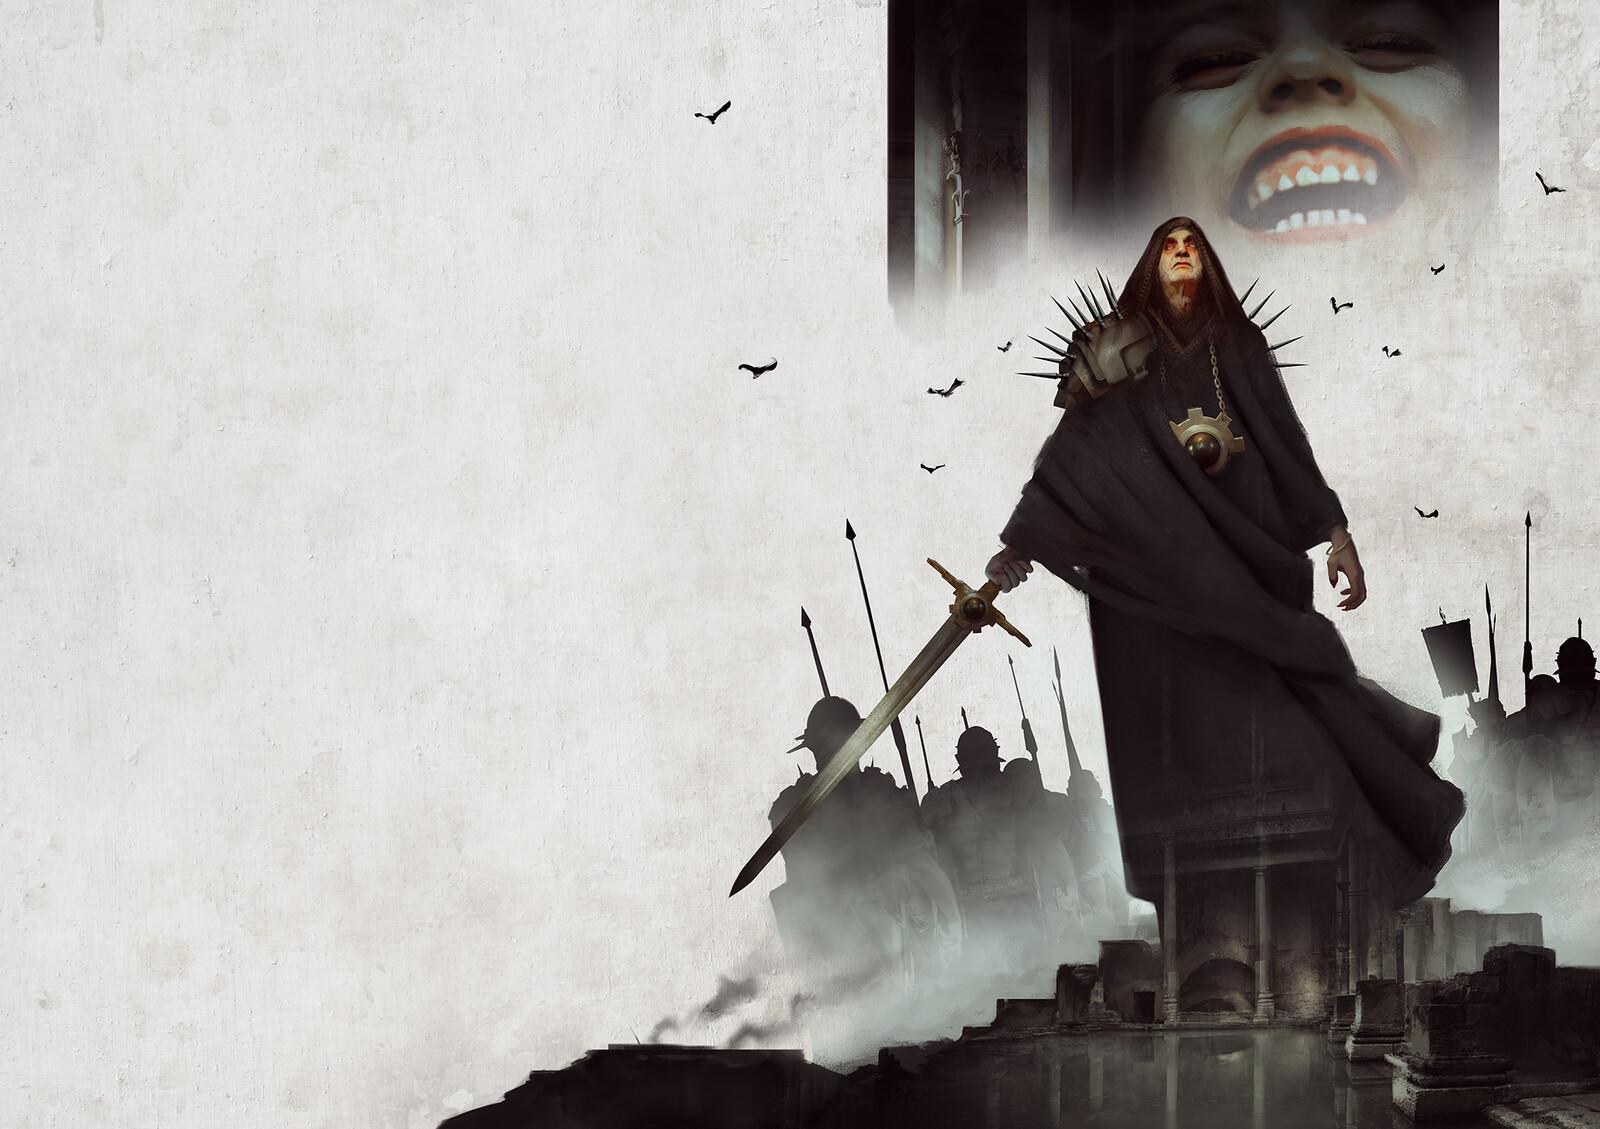 GODS - The Empire